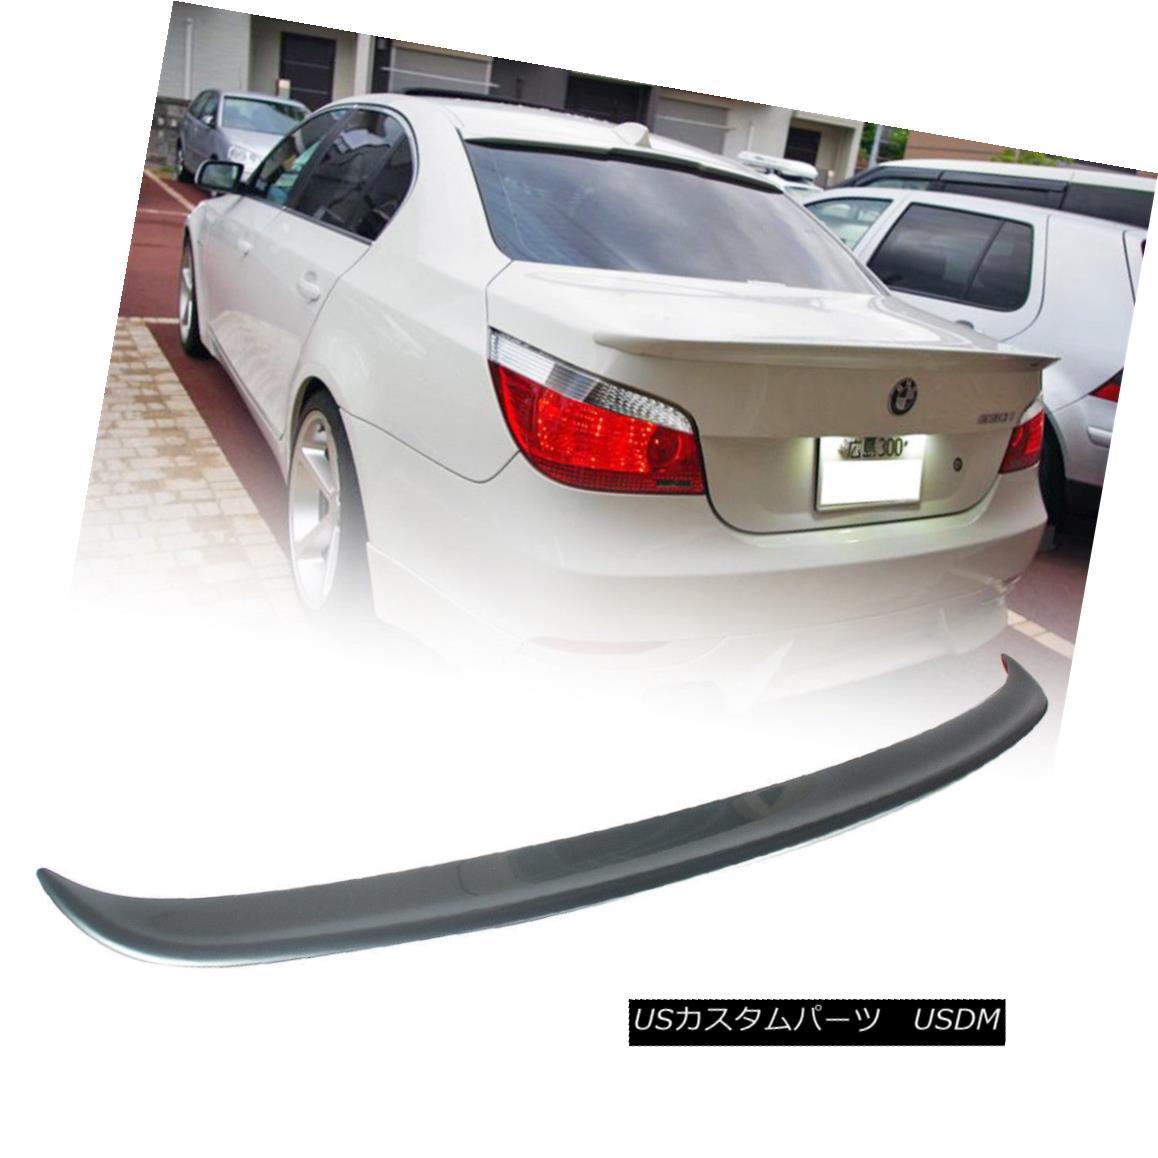 Carbon Fiber Rear Roof Spoiler Trunk Wing Fit for BMW E60 Sedan M5 2004-2010